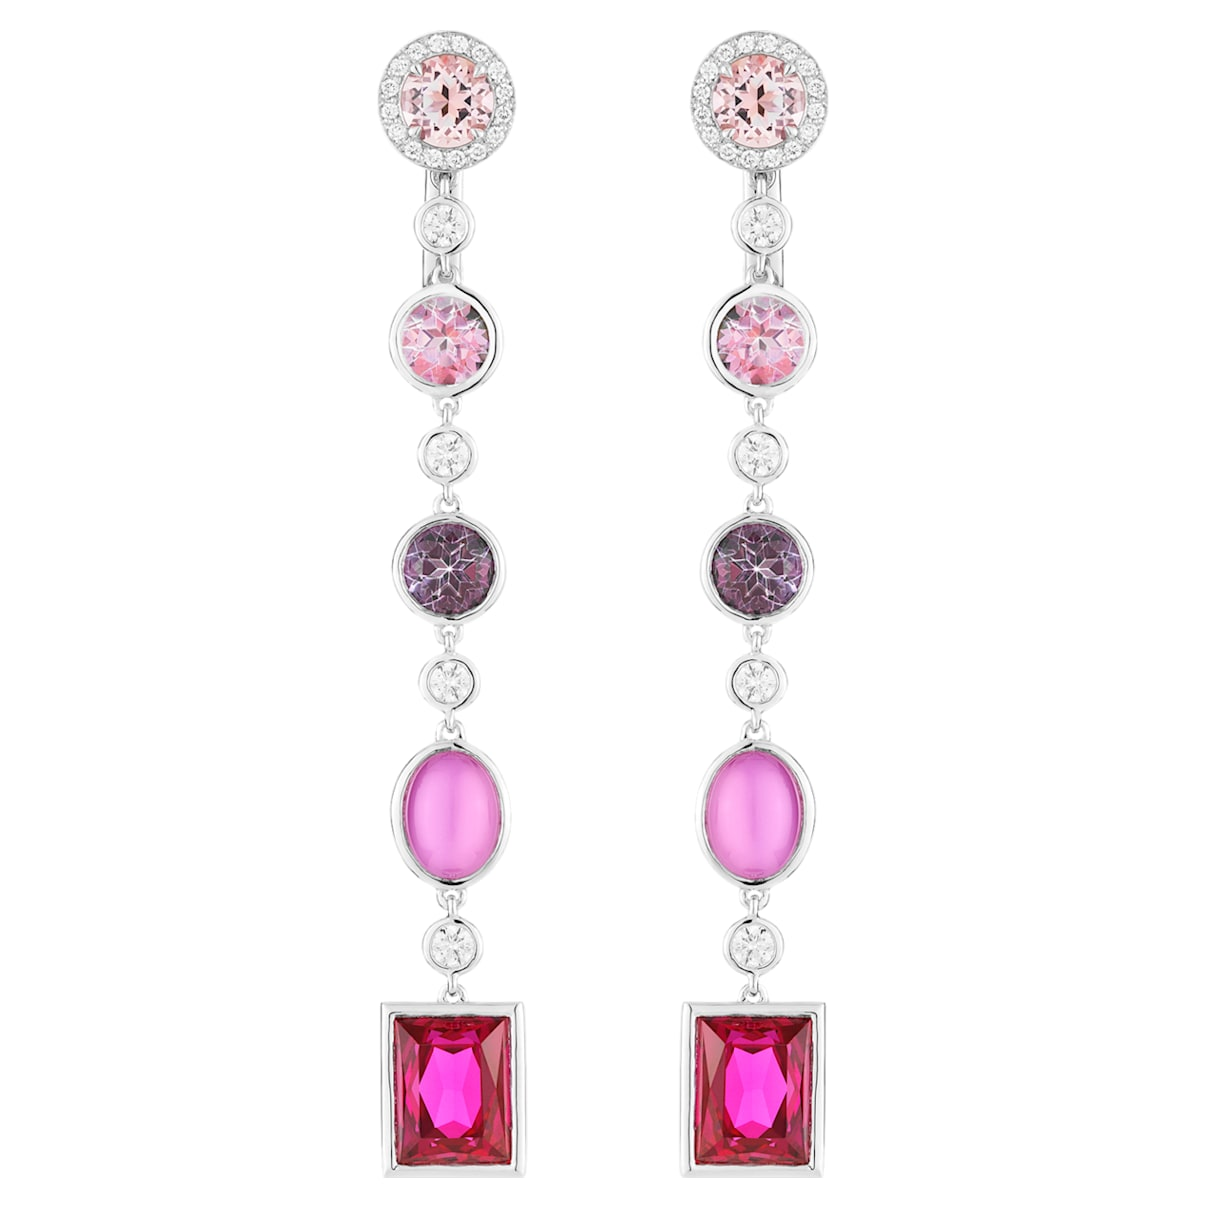 Flowering Fuchsia Earrings, Swarovski Created Ruby & Pink Treated Swarovski Genuine Topaz, 18K White Gold